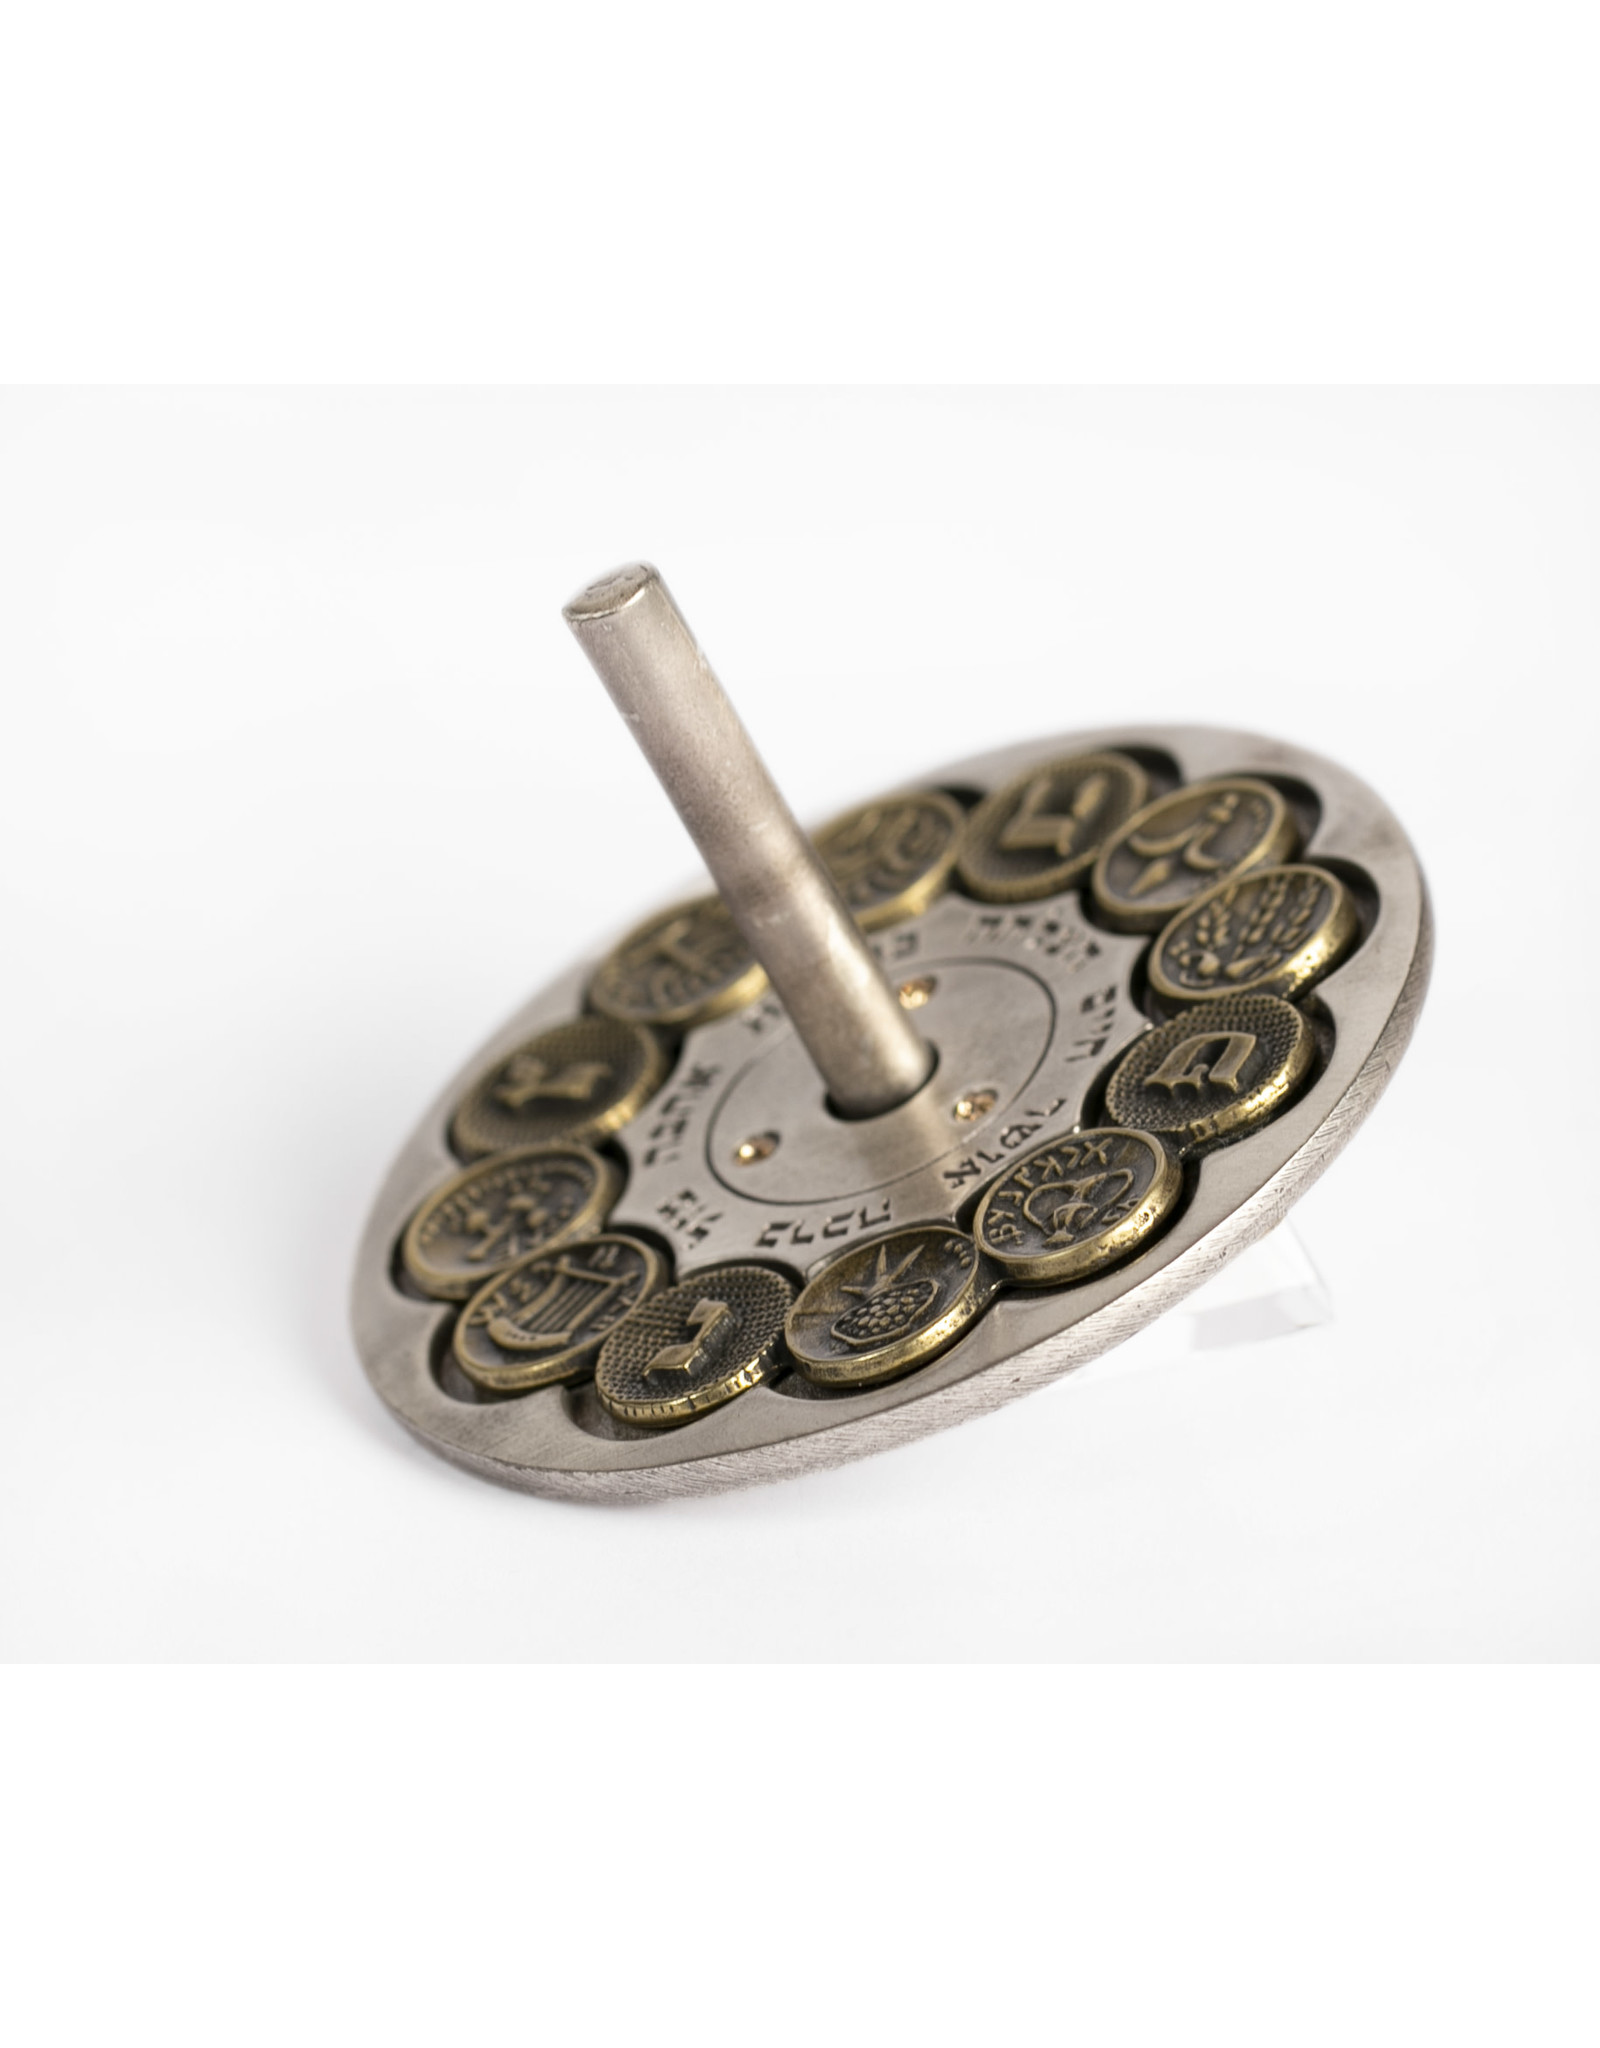 Dreidel  Large  Alloyed Metal Coins